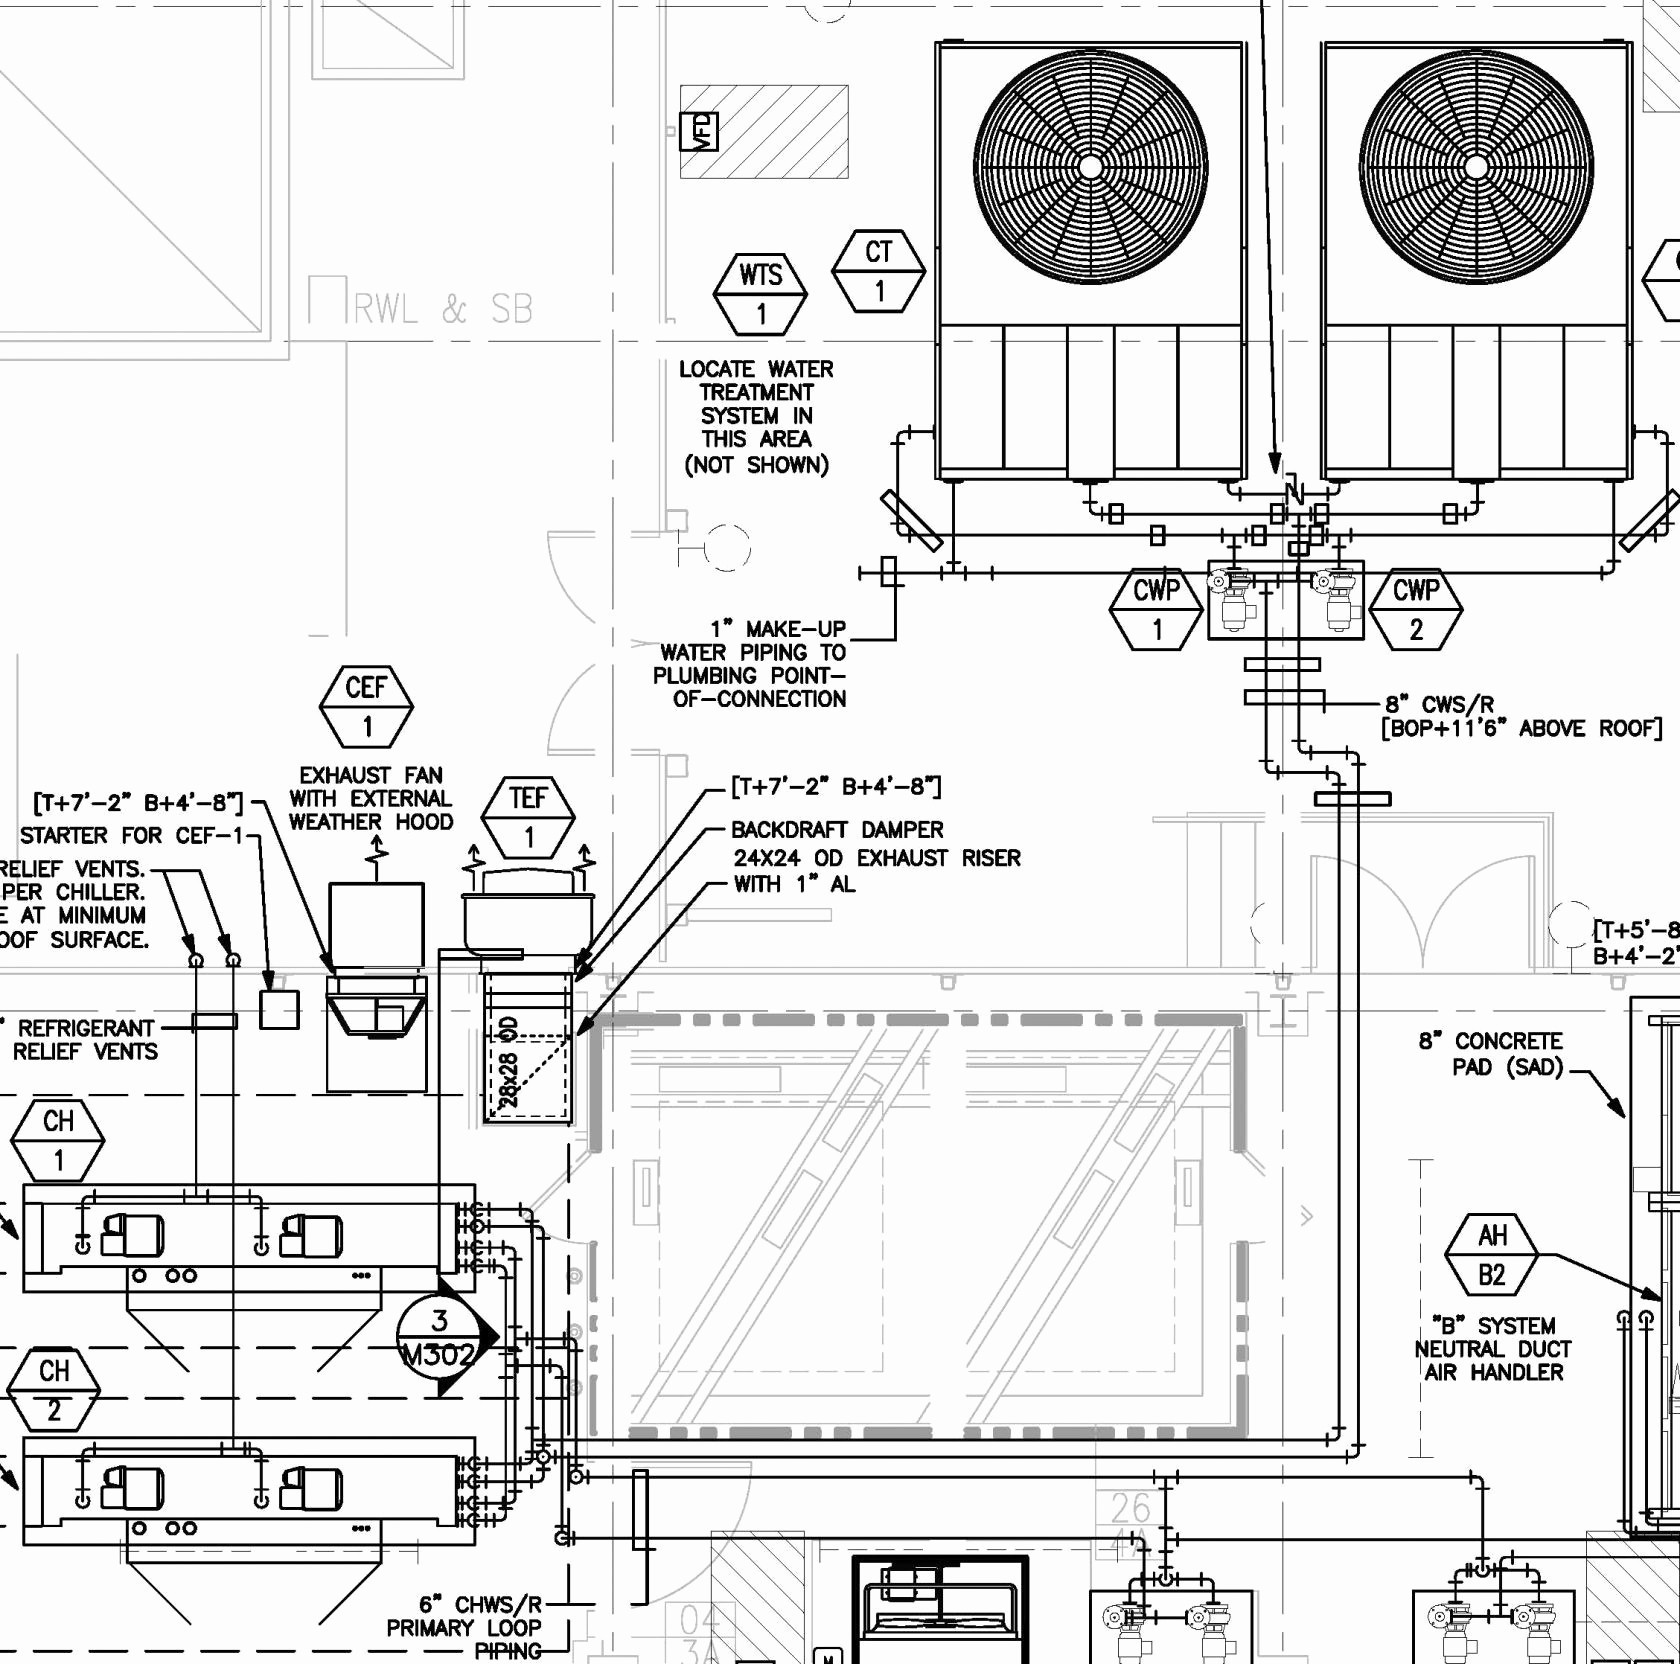 Hayward Pump Parts Diagram Hayward Pool Pump Motor Wiring Diagram Reference Pool Heat Pump Of Hayward Pump Parts Diagram